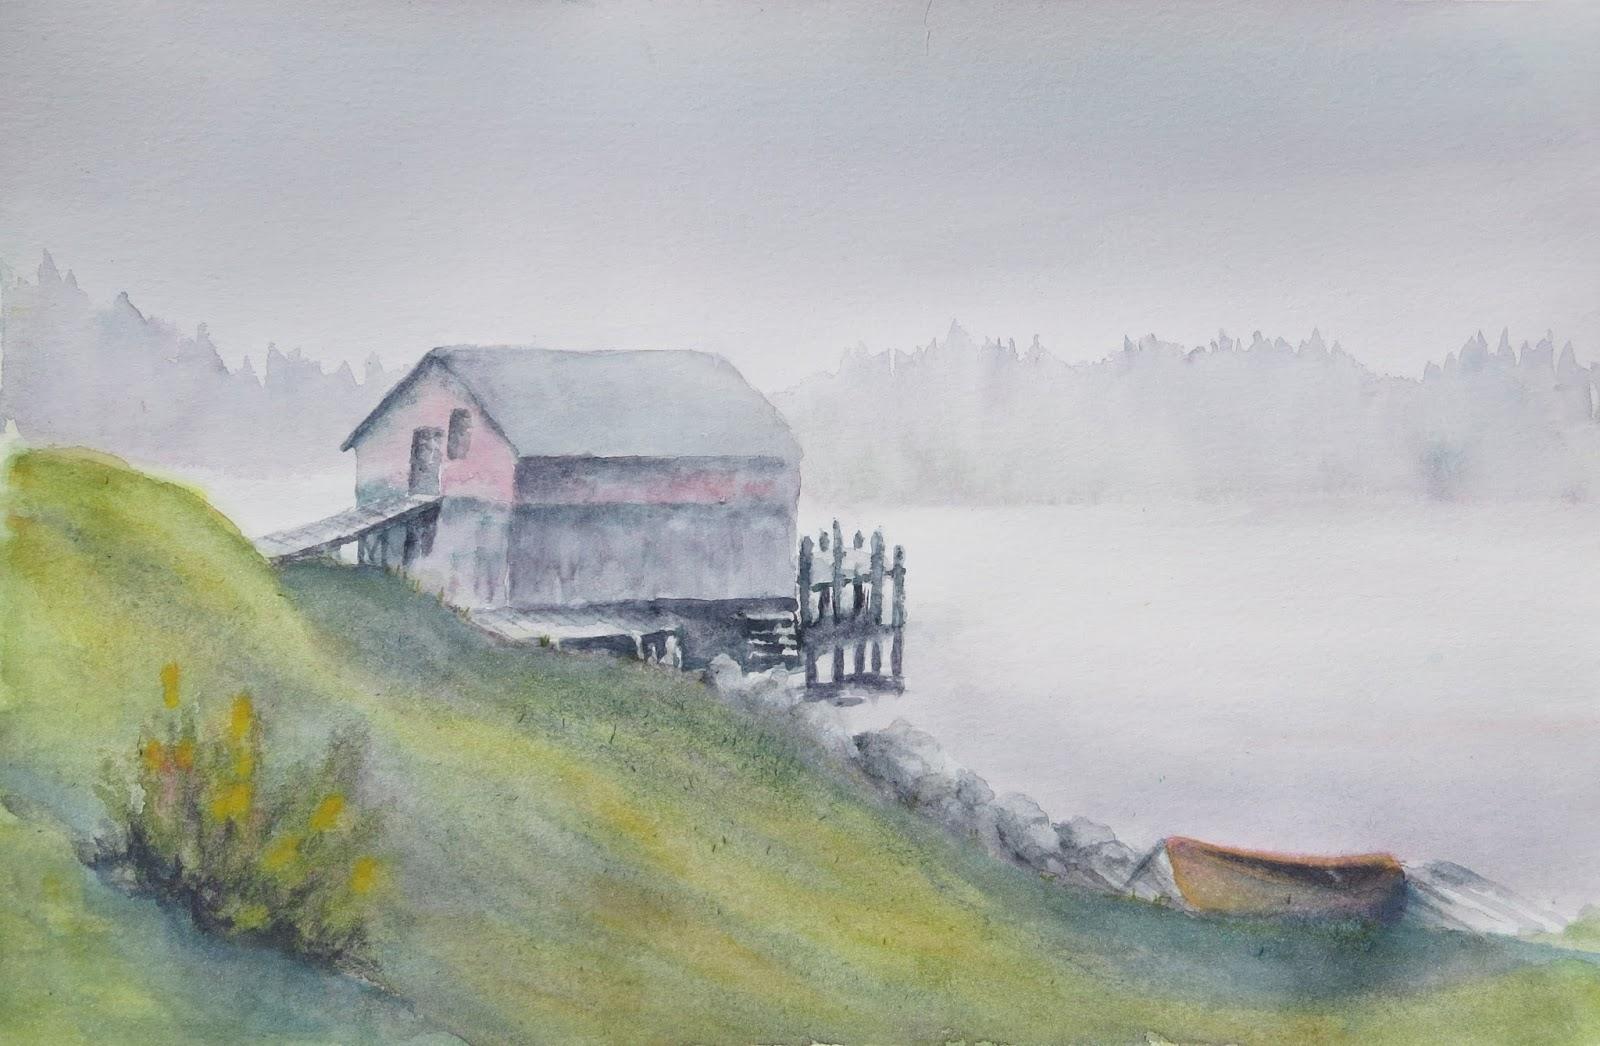 Mes aquarelles - La cabane au bord du lac ...